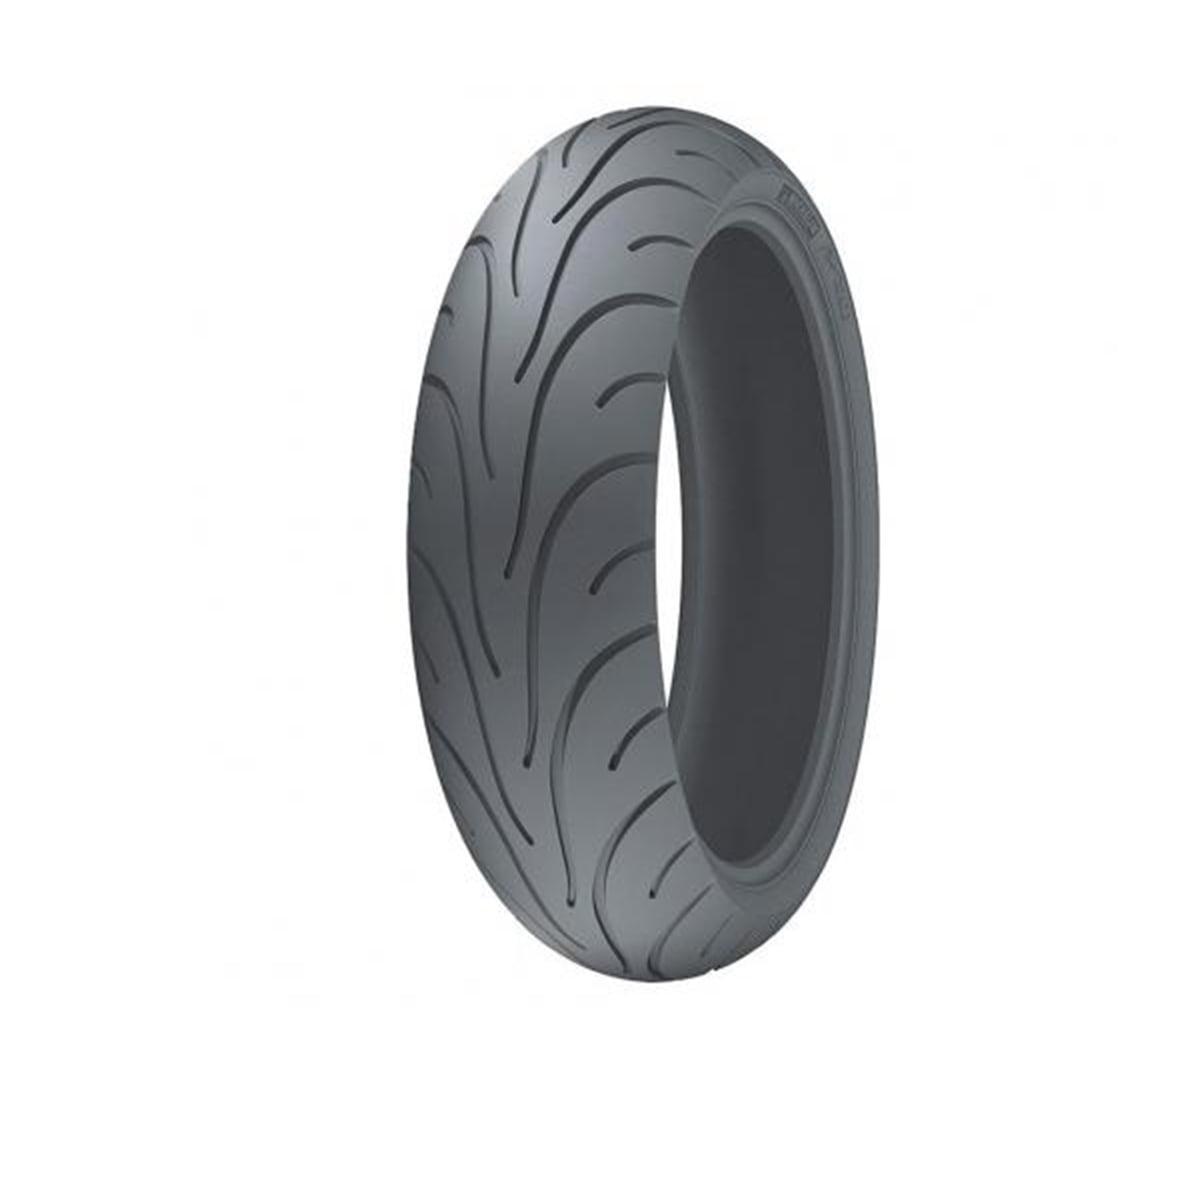 Pneu Traseiro Moto Michelin 180/55-17 Road 2